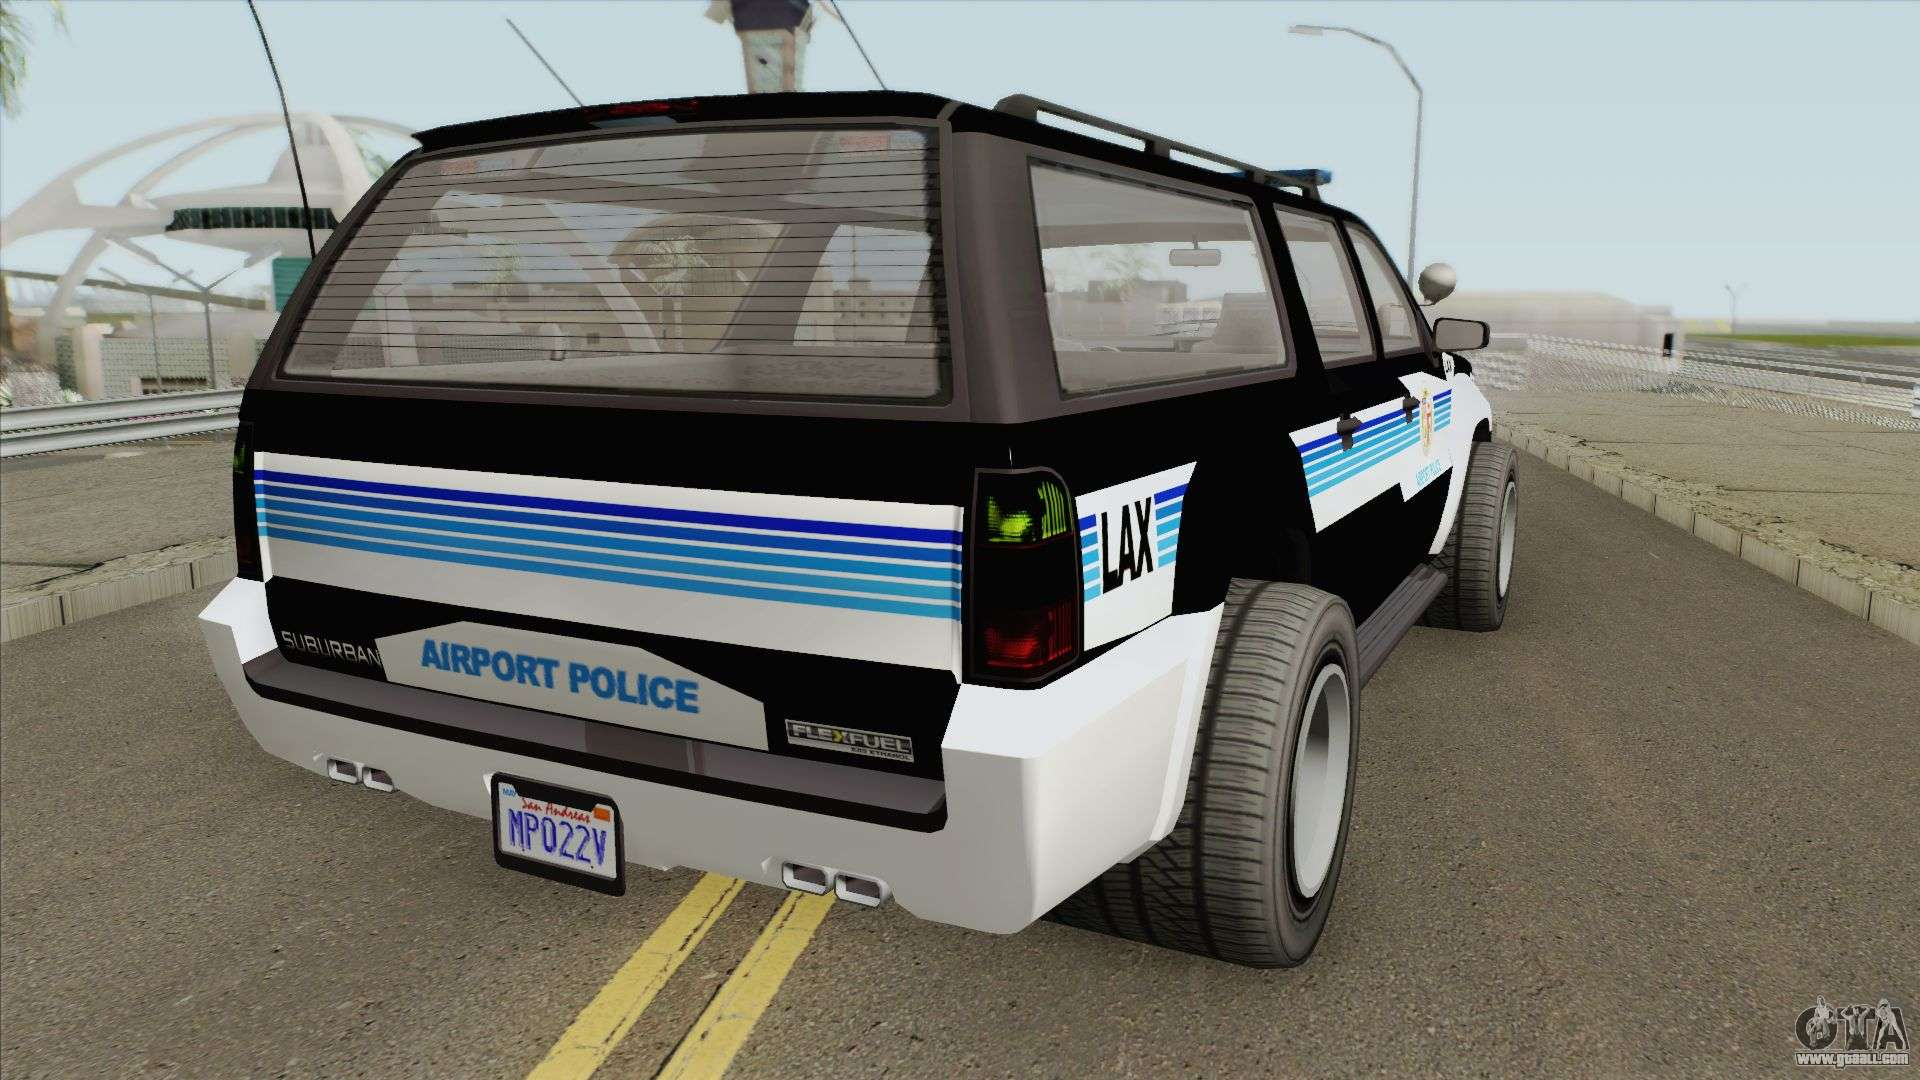 Chevrolet Suburban Lax Airport Police For Gta San Andreas